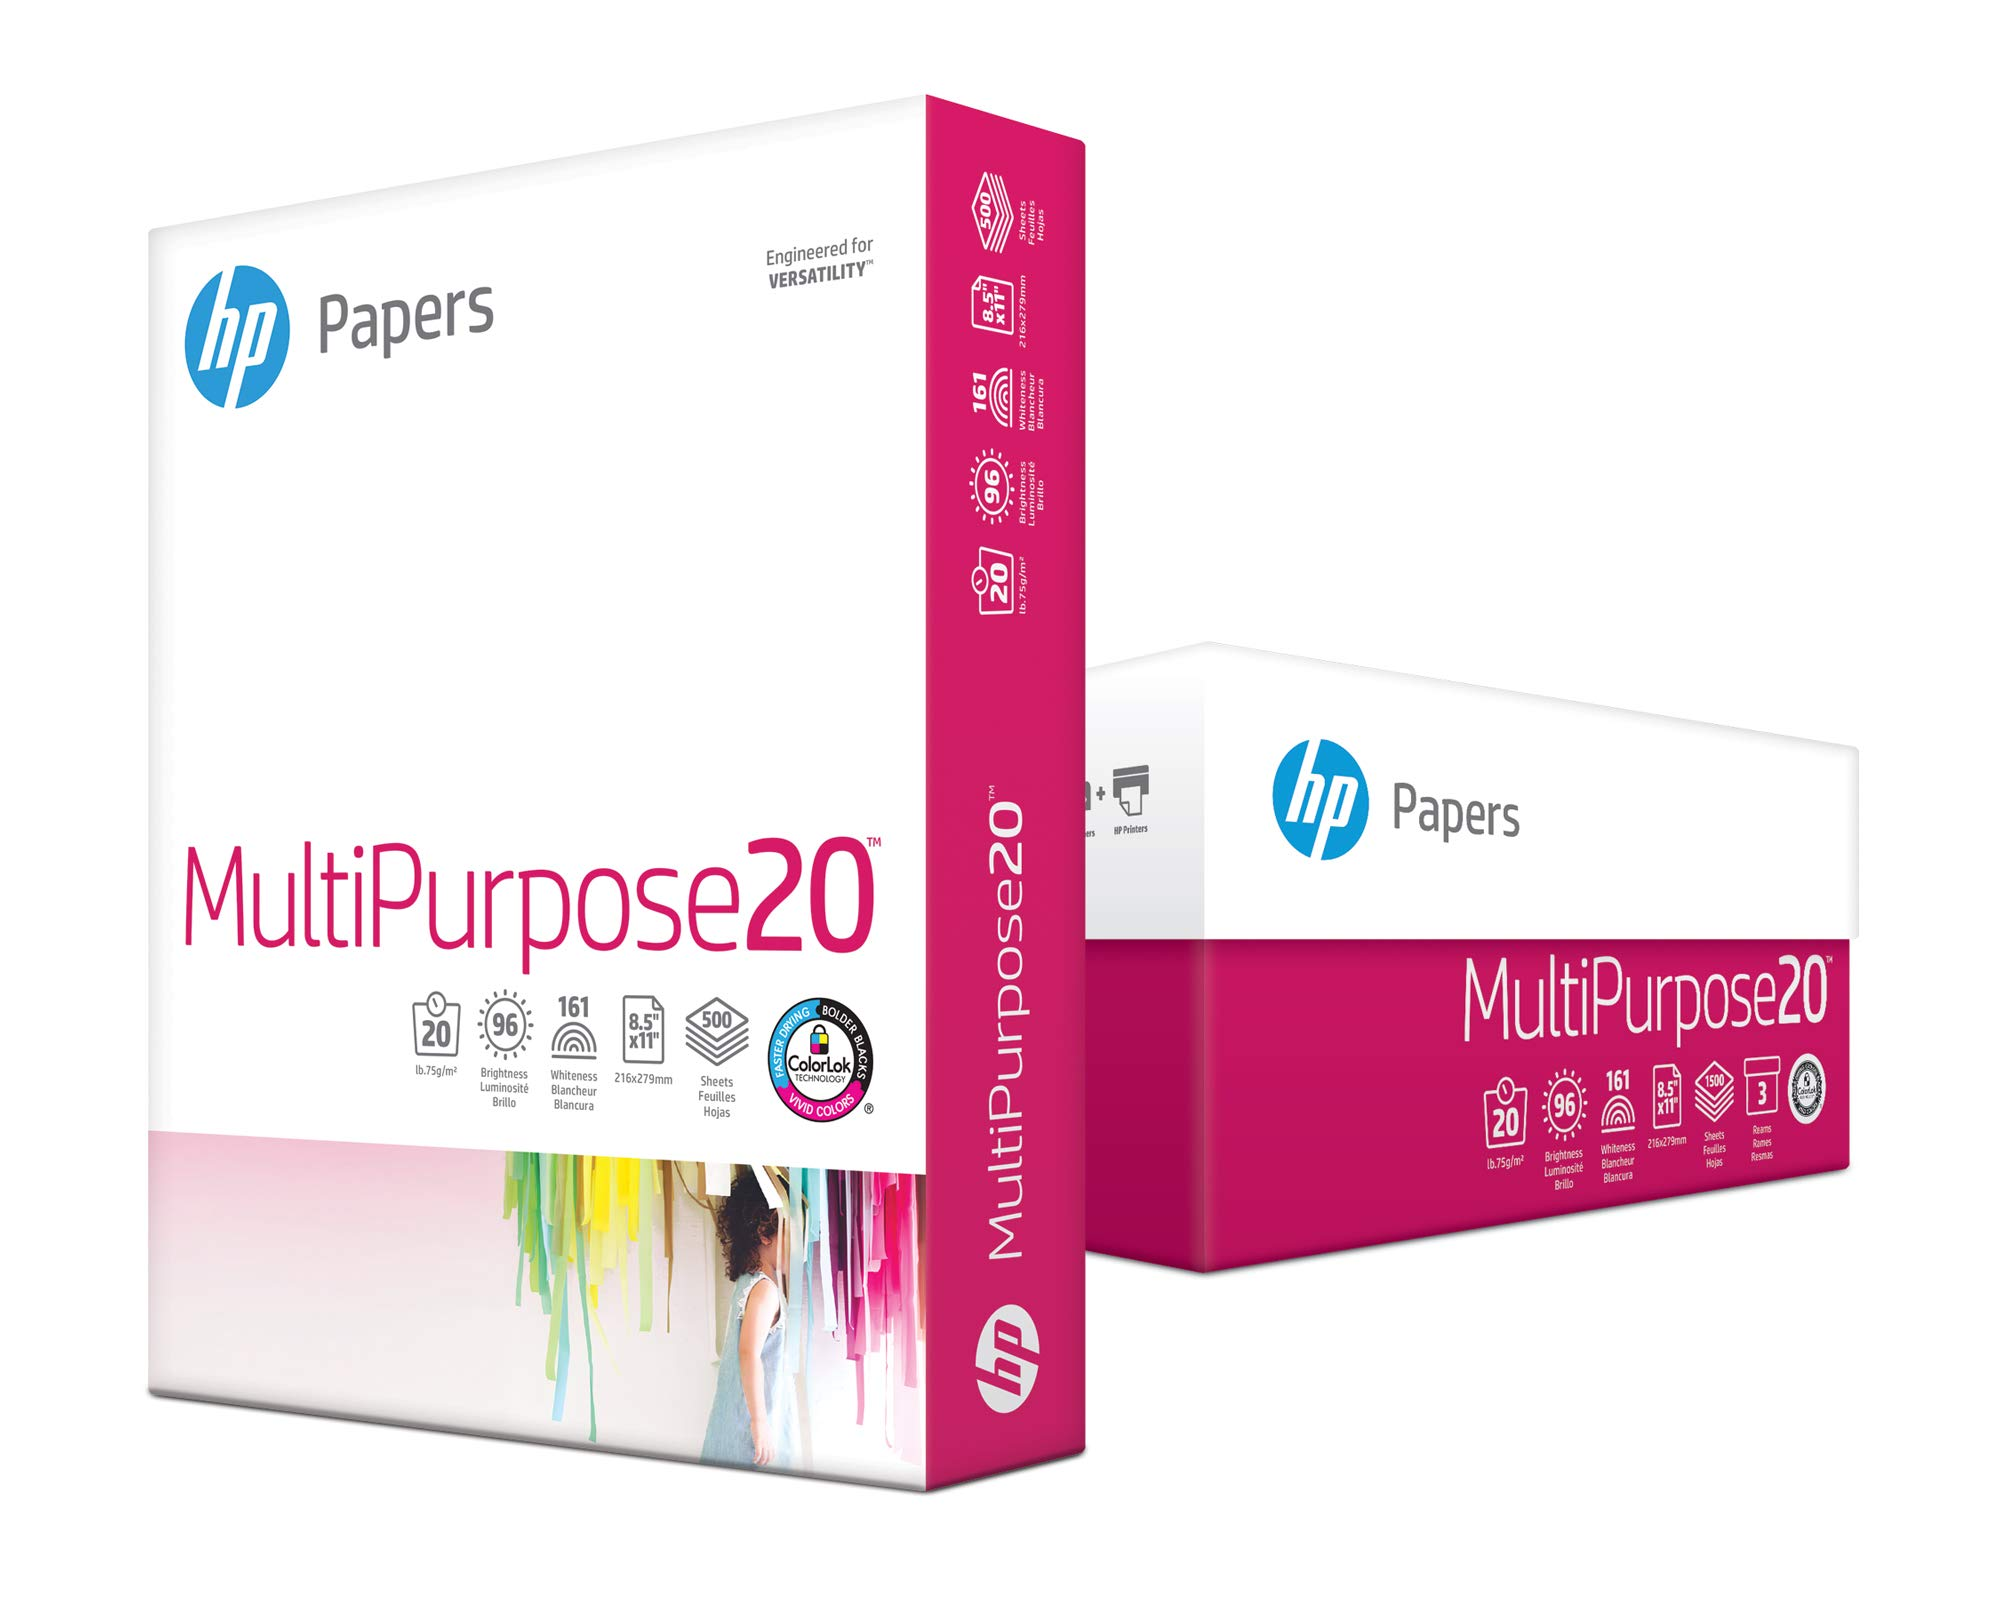 HP Printer Paper, Multipurpose20, 8.5 x 11, 20lb, 96 Bright, 1,500 Sheets / 3 Ream Carton (112530C) Made In The USA